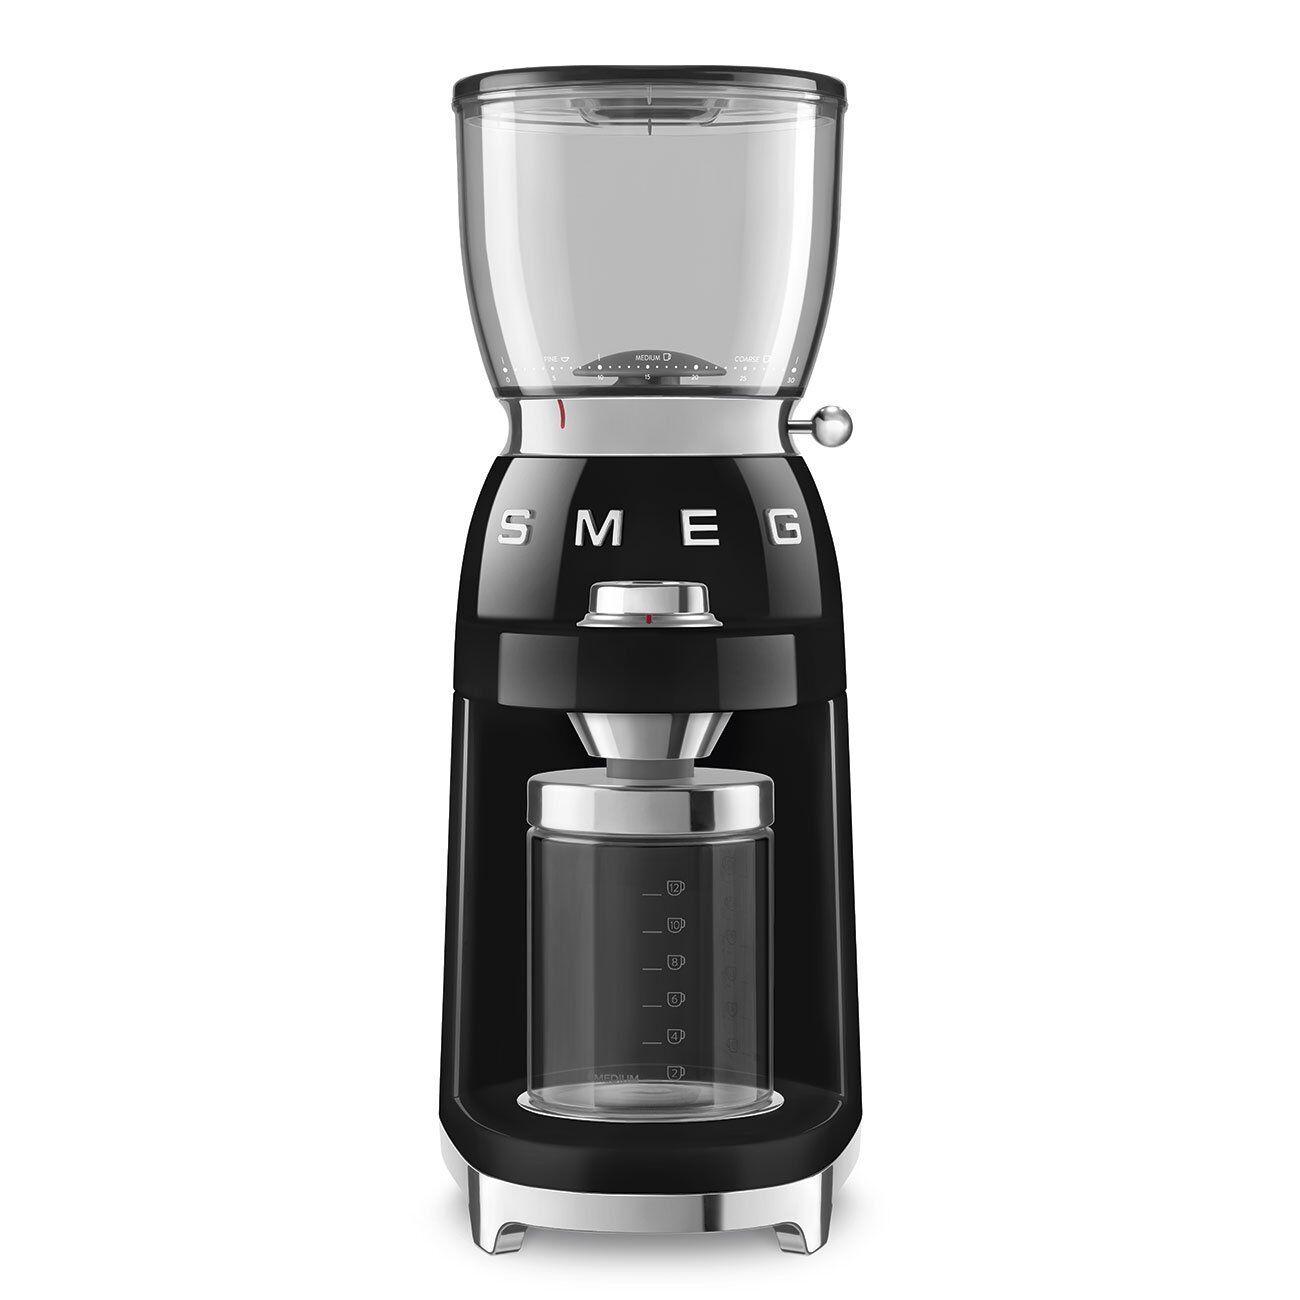 Smeg CGF01BLUK Coffee Grinder - Black